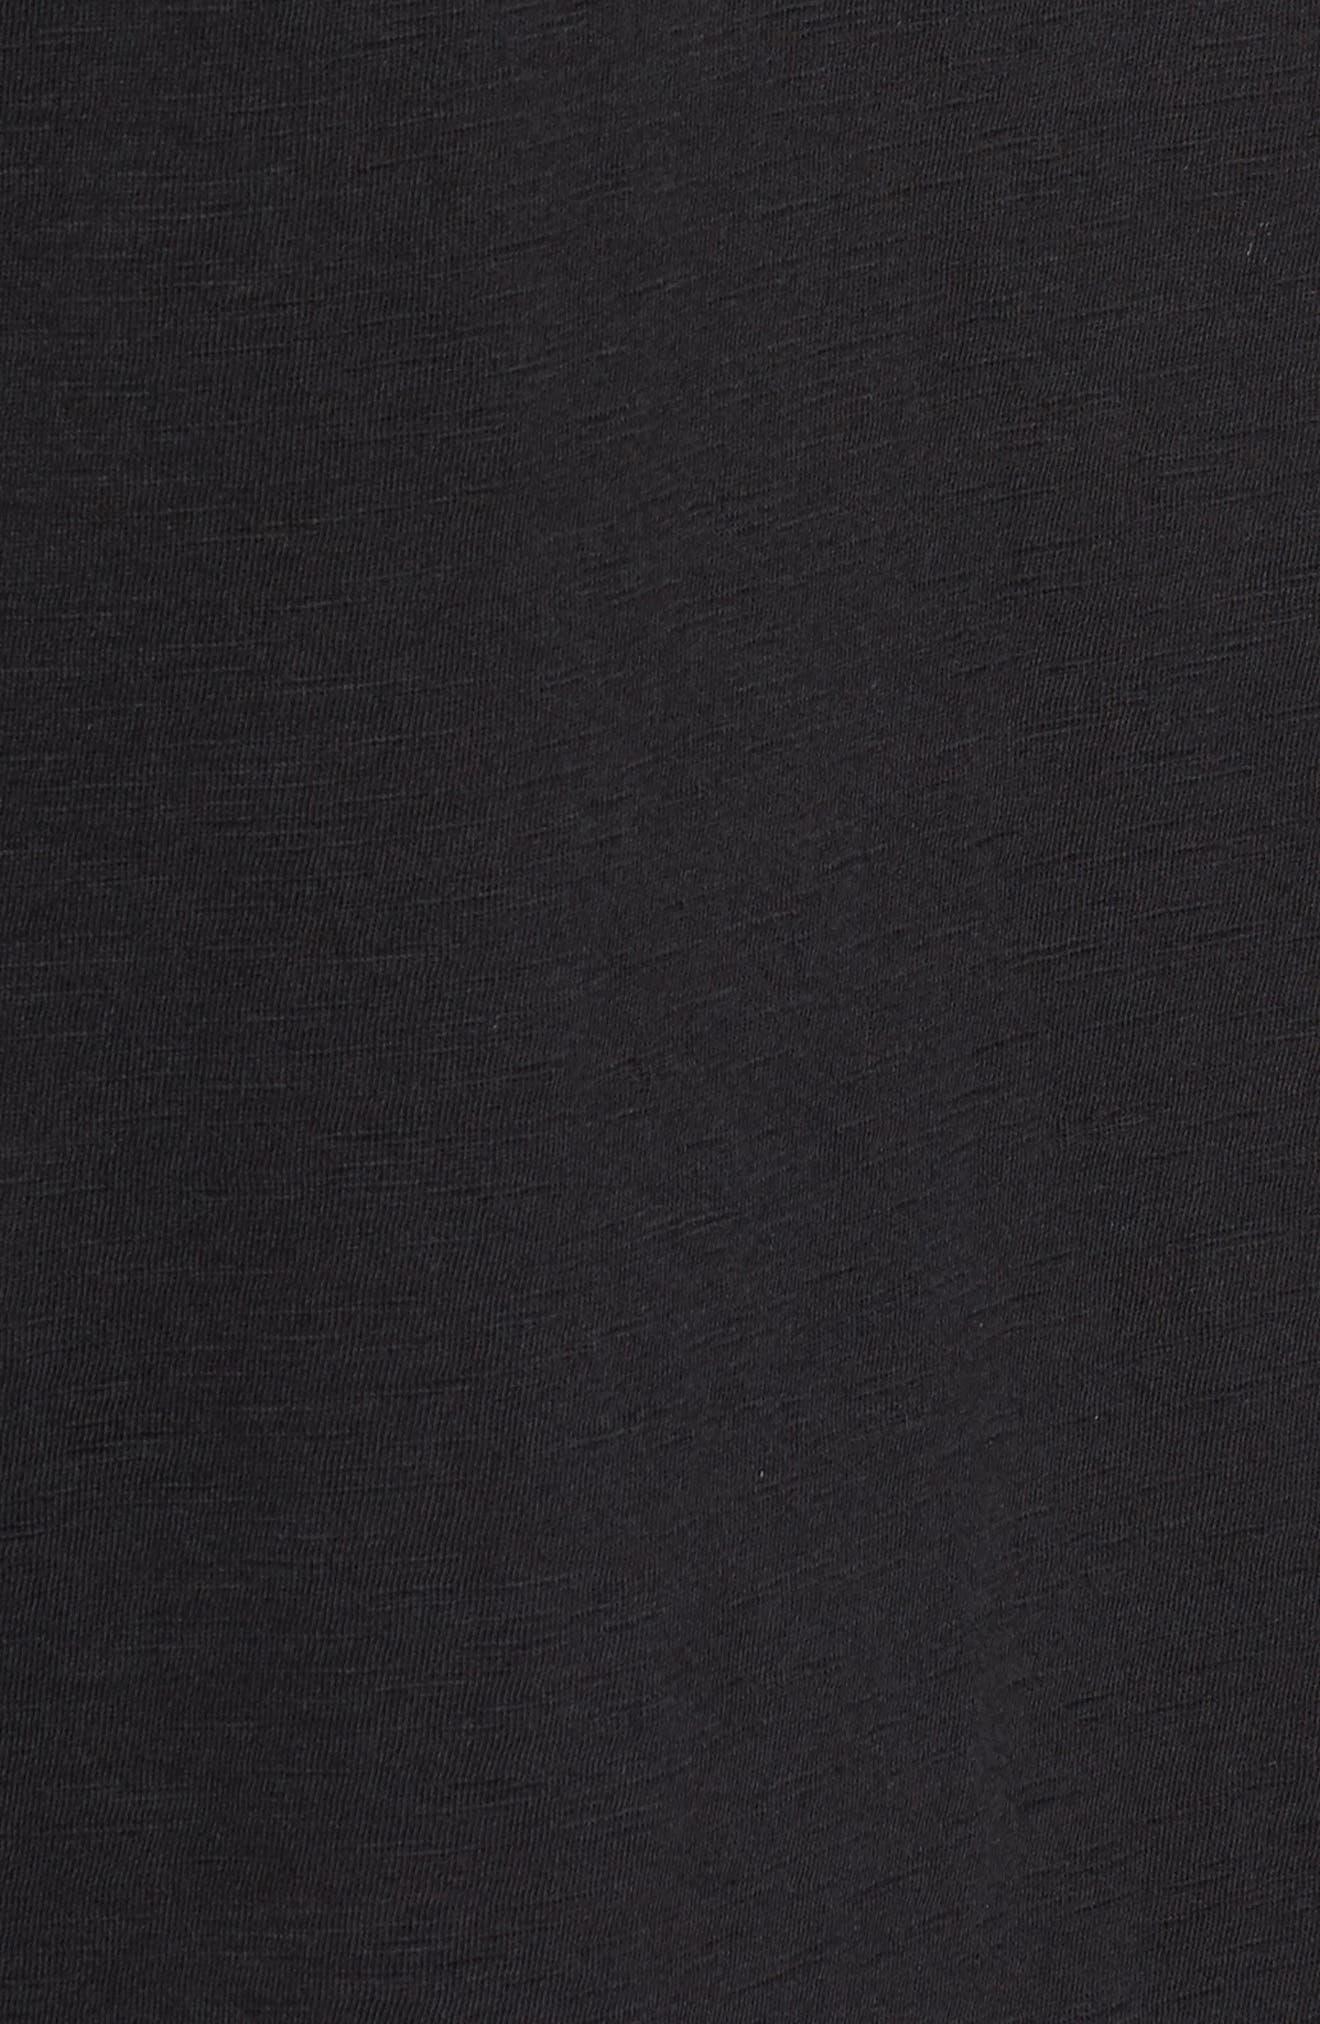 Eyelet Trim Three-Quarter Sleeve Tee,                             Alternate thumbnail 5, color,                             Black